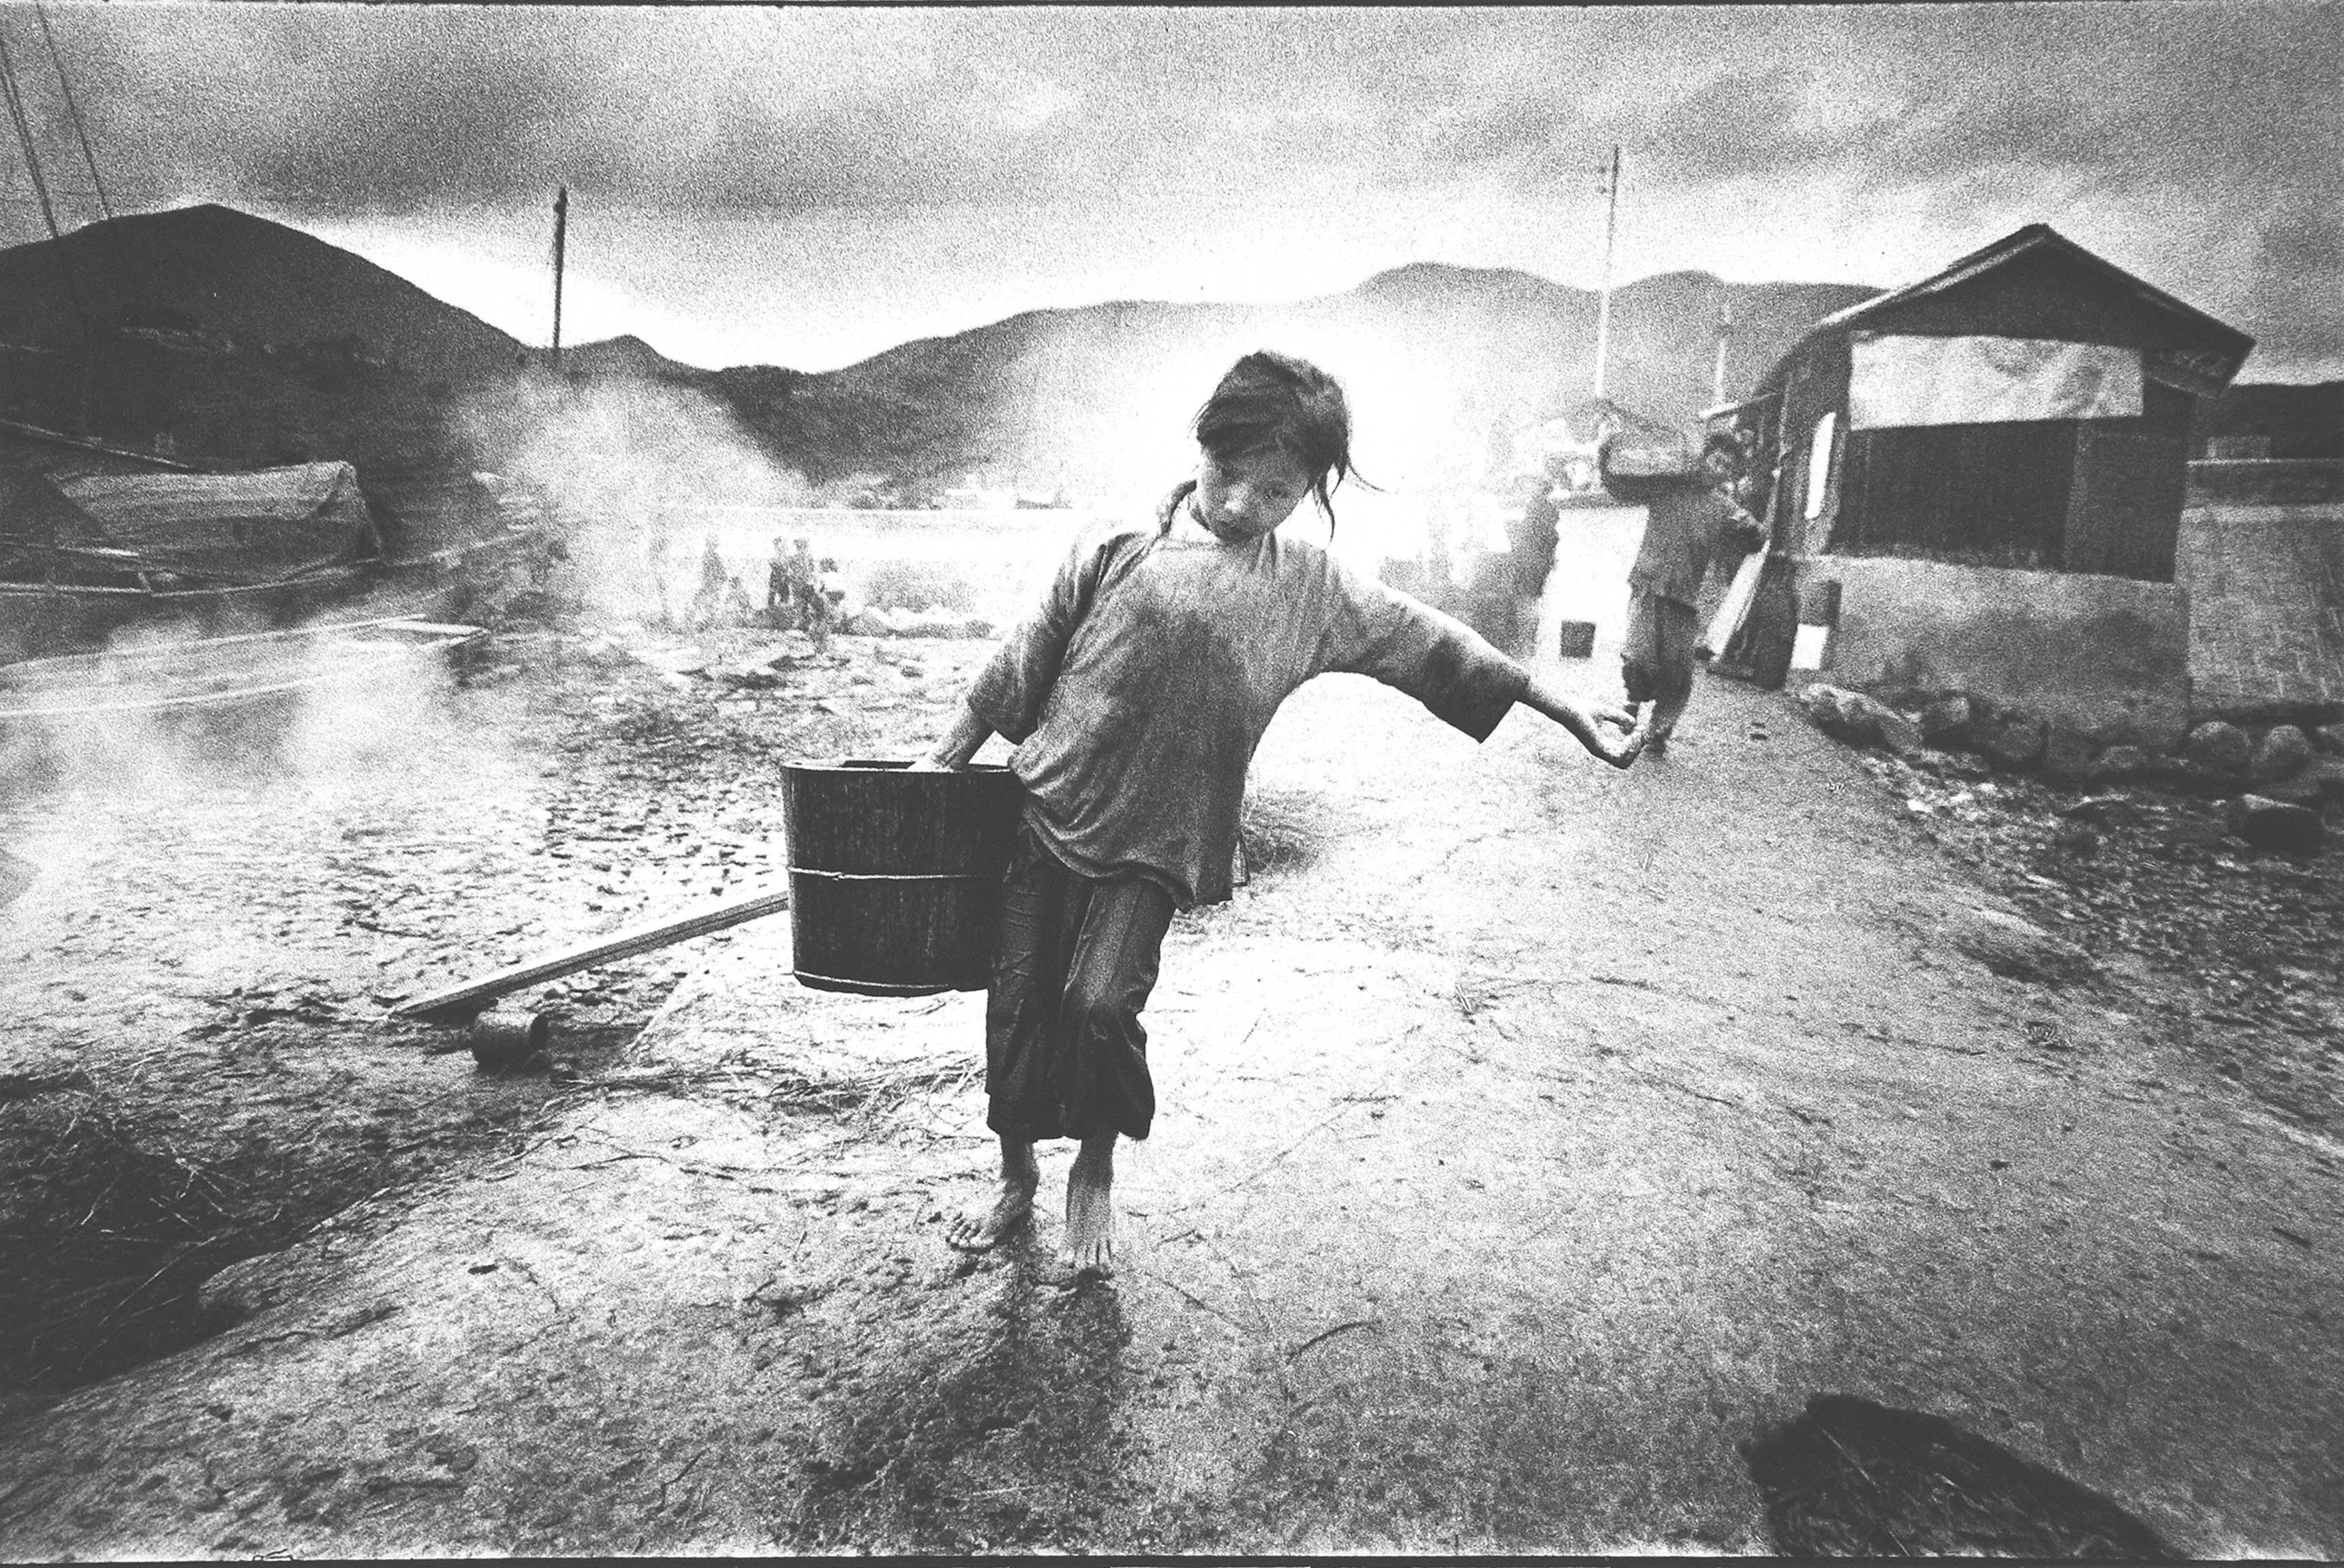 Ed van der Elsken, Hong Kong, 1959-1960. Nederlands Fotomuseum Rotterdam © Ed van der Elsken / Collections spéciales de l'université de Leyde